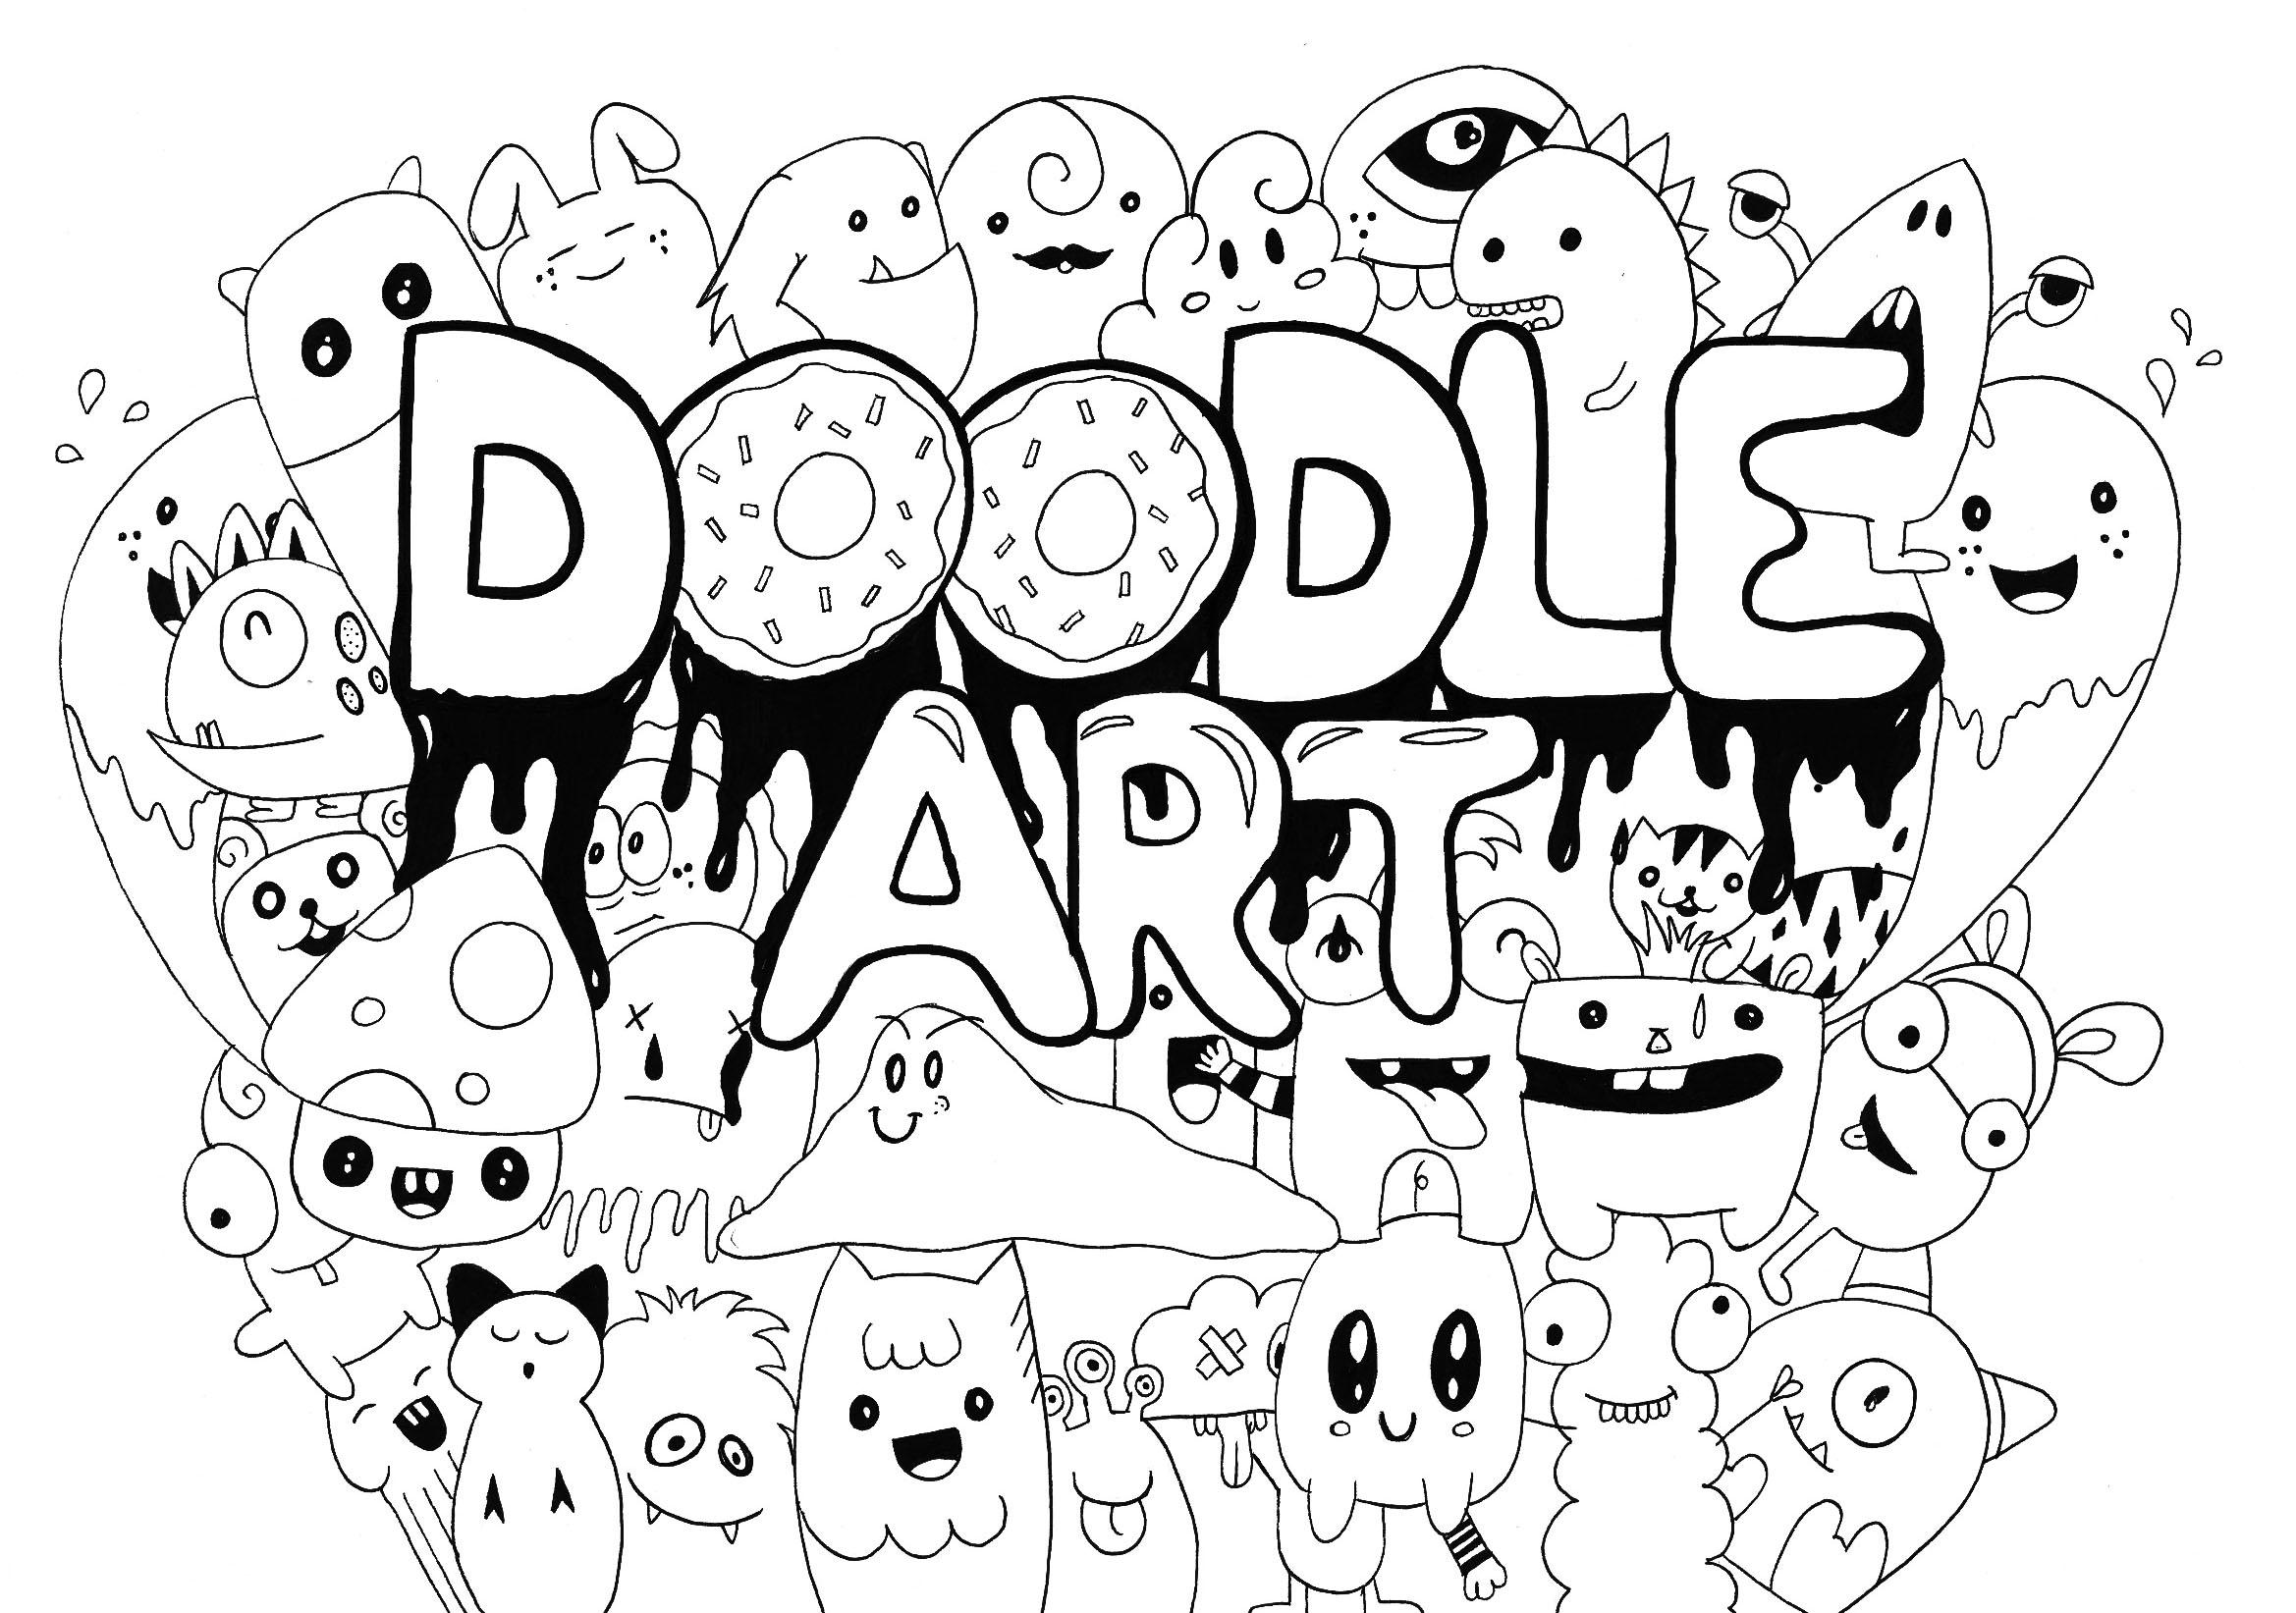 Doodle Art Rachel Doodling Doodle Art Coloring Pages For